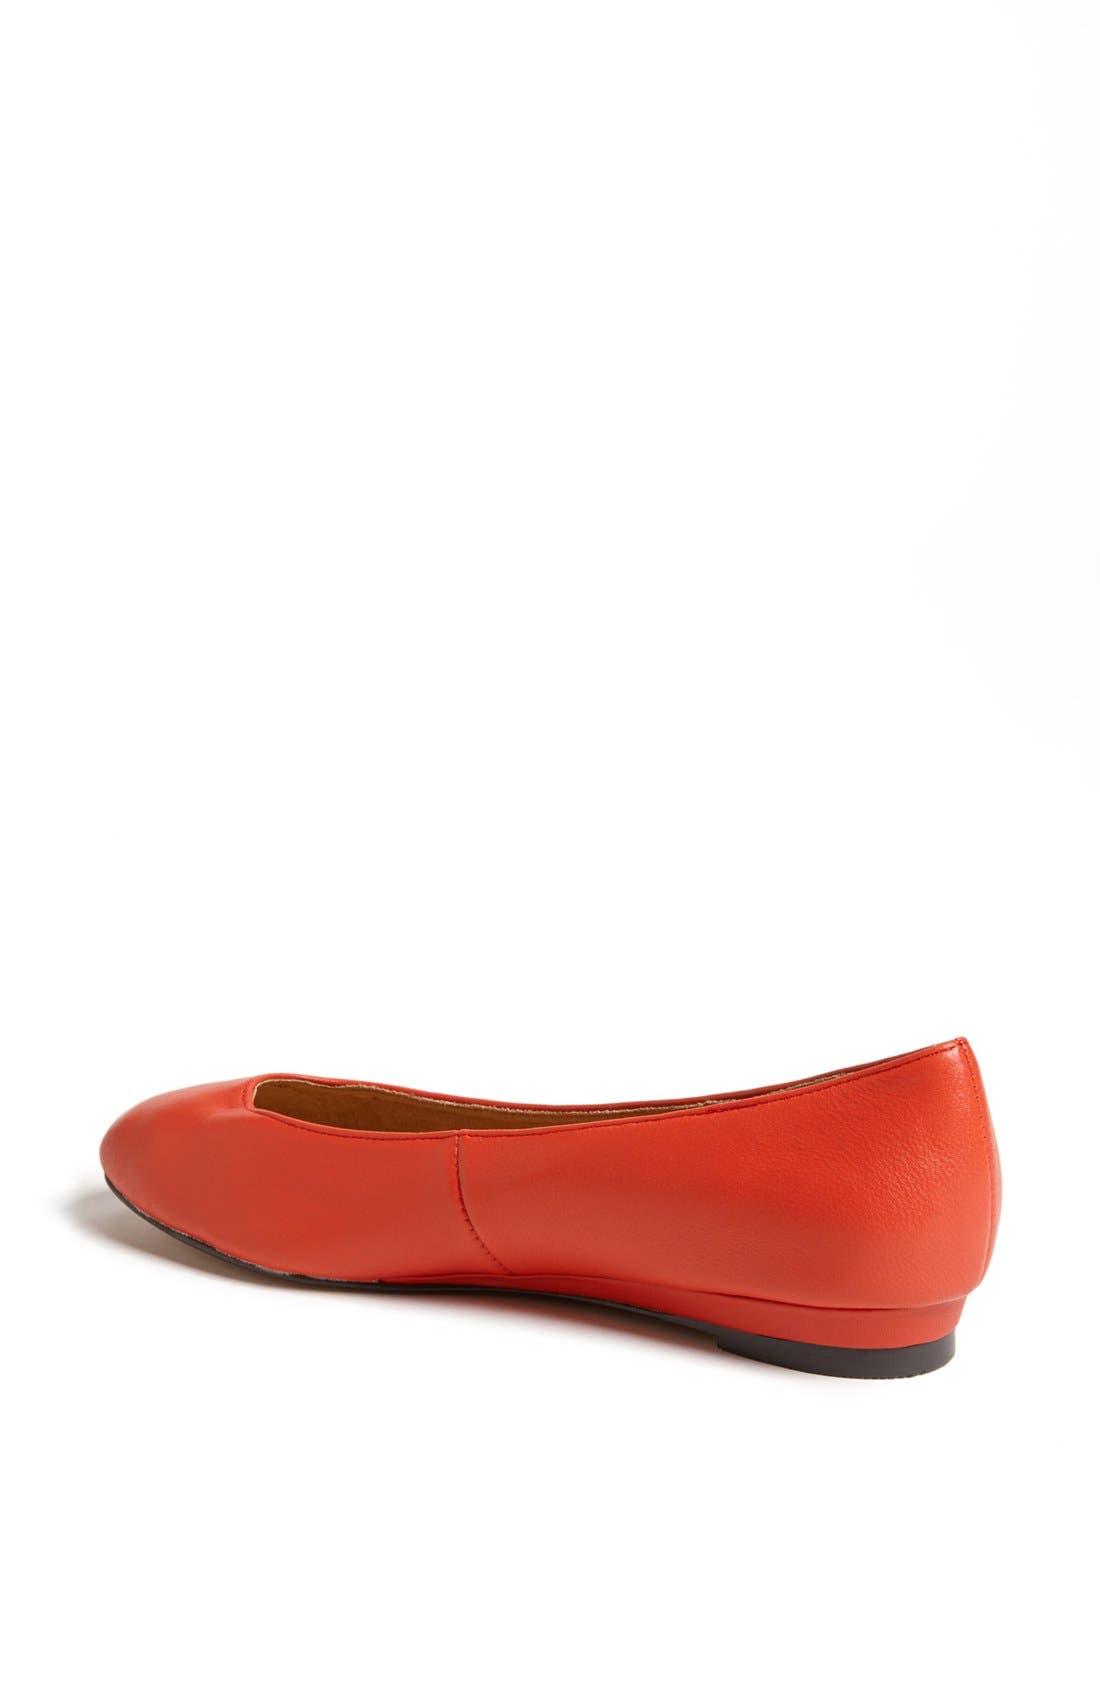 Alternate Image 2  - Topshop 'Mello - Mini Wedge' Court Shoe